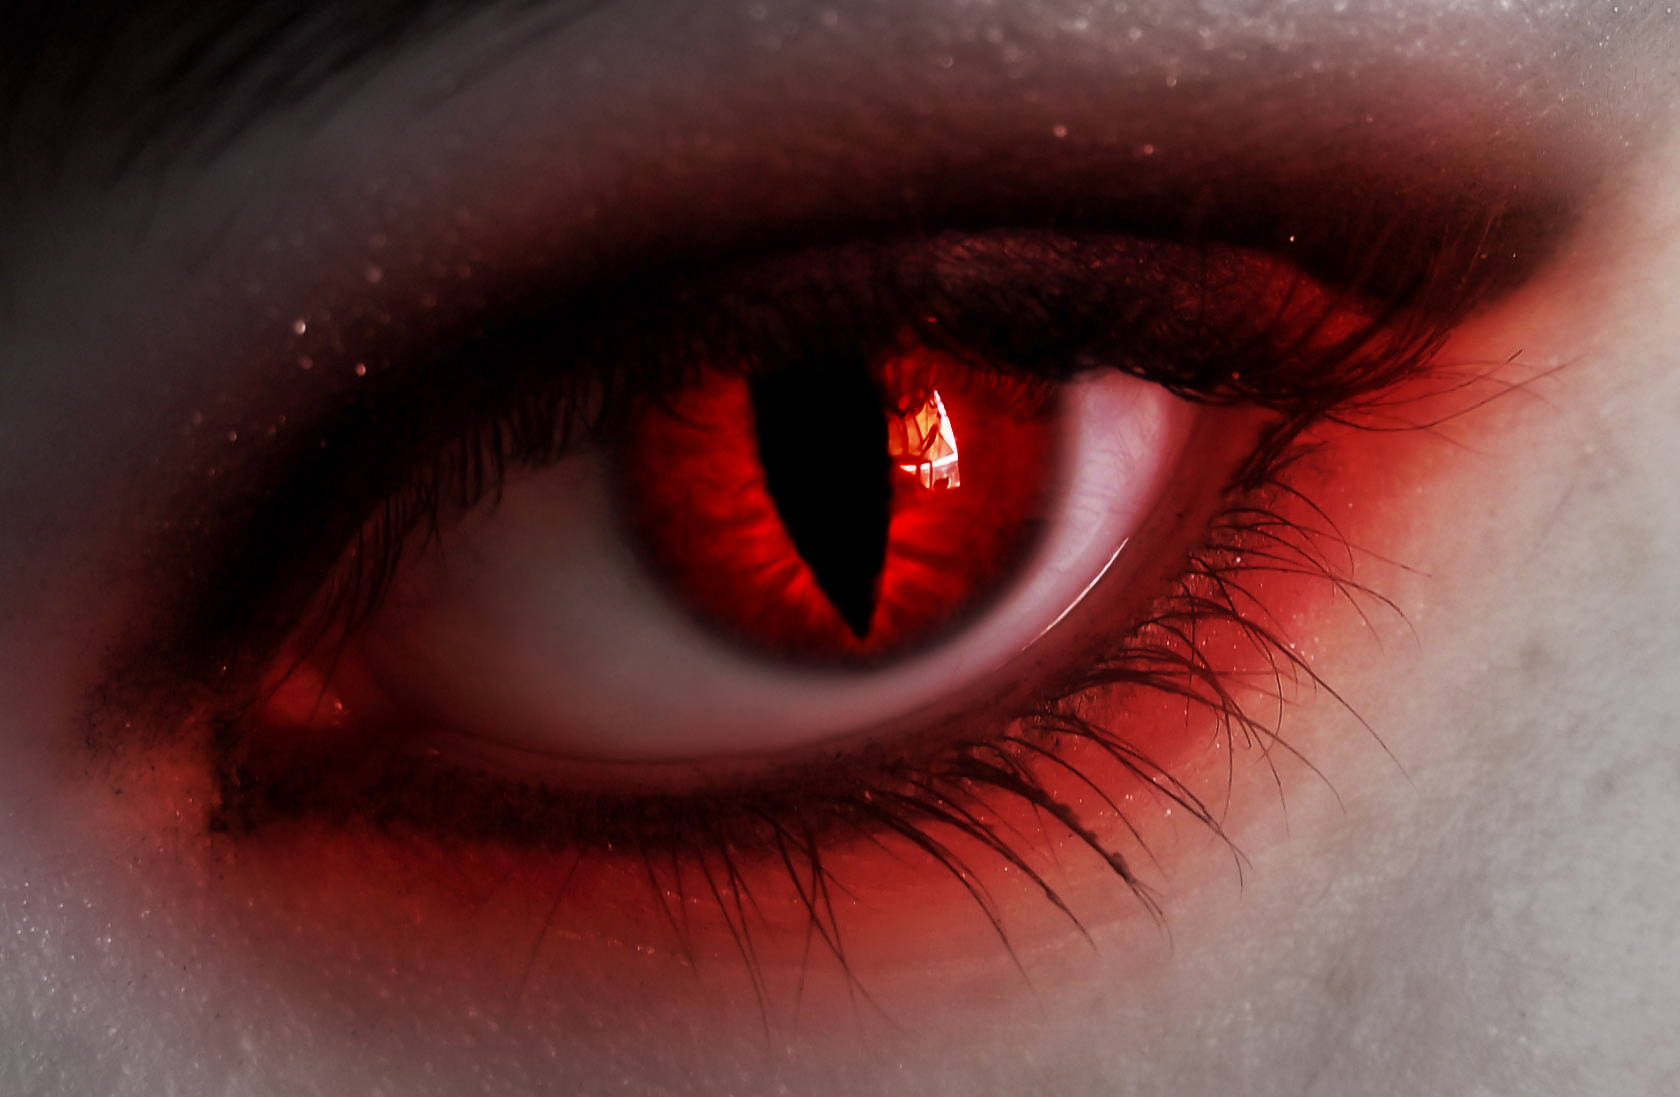 Evil eye by tomhotovy on DeviantArt